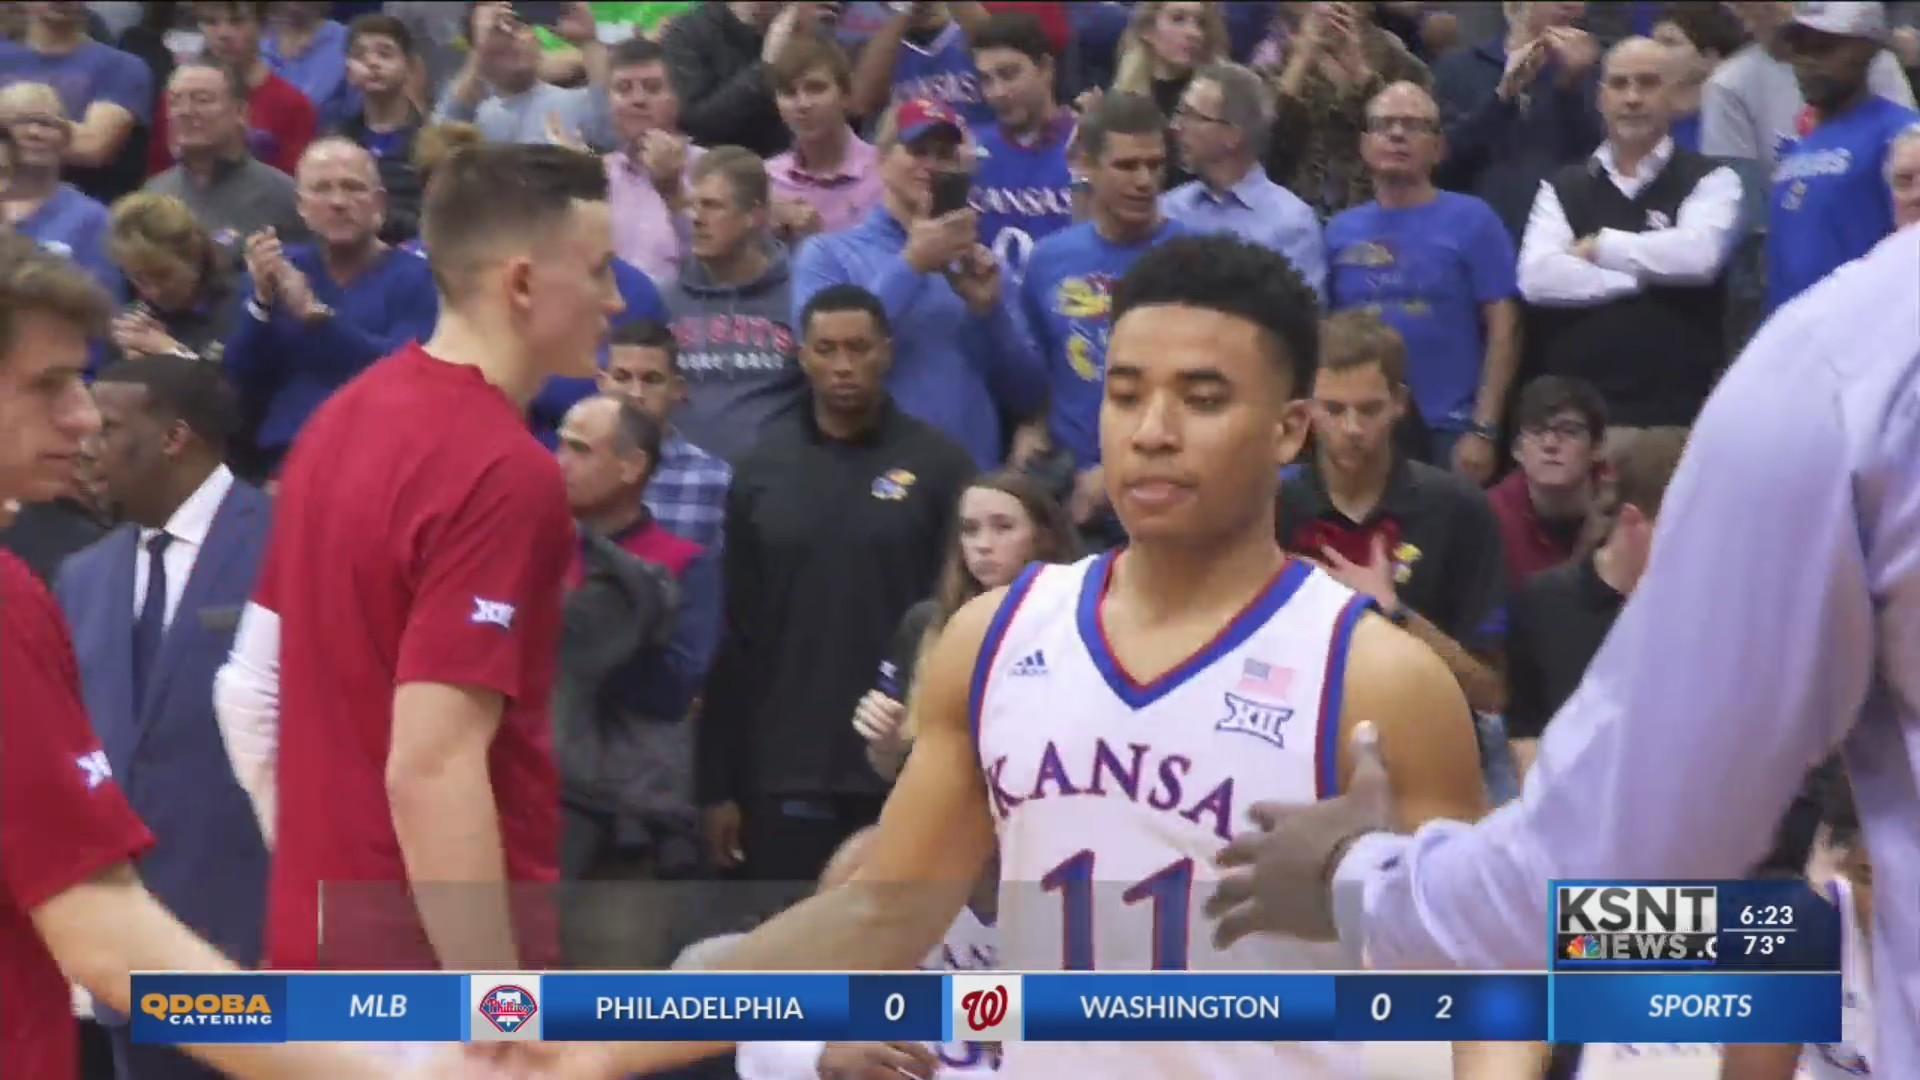 5_reasons_KU_Basketball_could_earn_prese_0_20190619233621